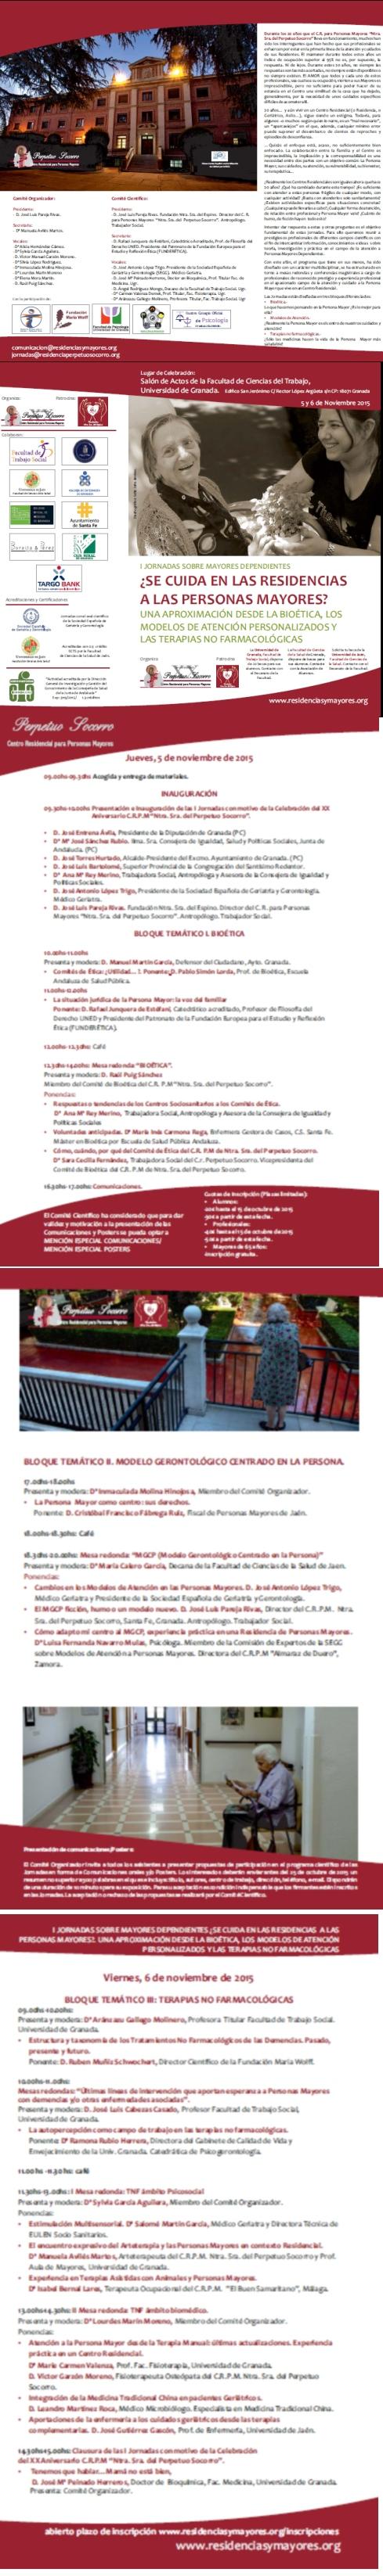 20151022192905-santa-fe-jornadas-programa-2015.jpg